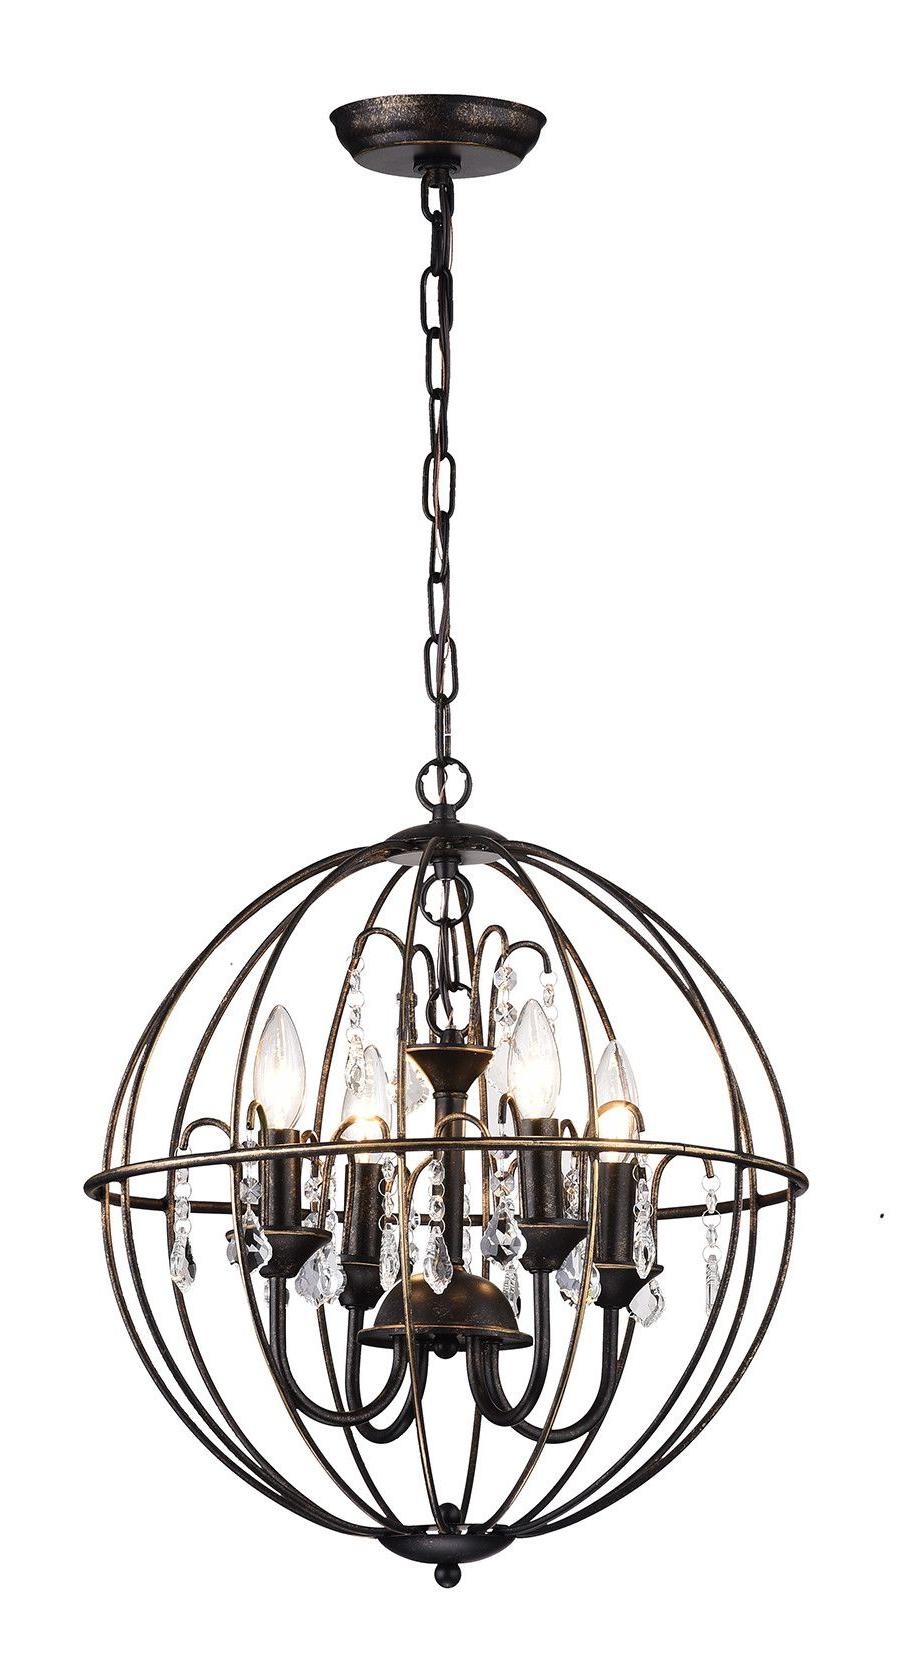 Chandelier Regarding Current Donna 6 Light Globe Chandeliers (View 5 of 20)